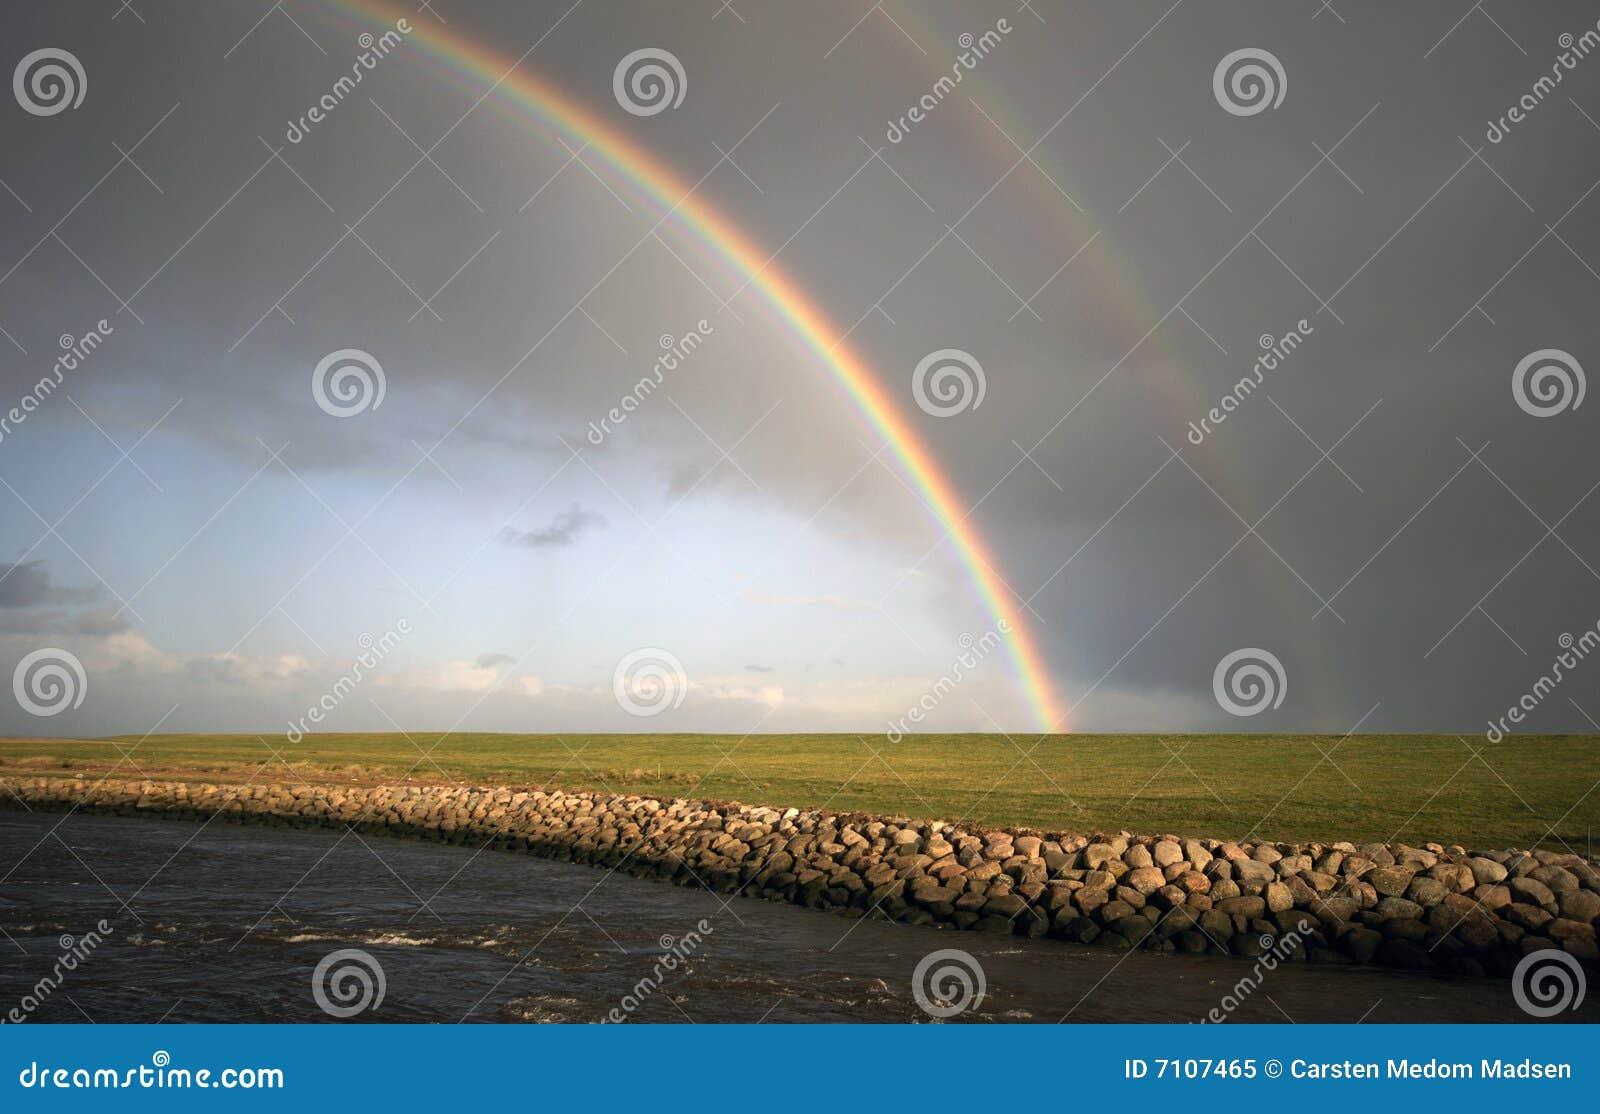 part of double rainbow royalty free stock photo image